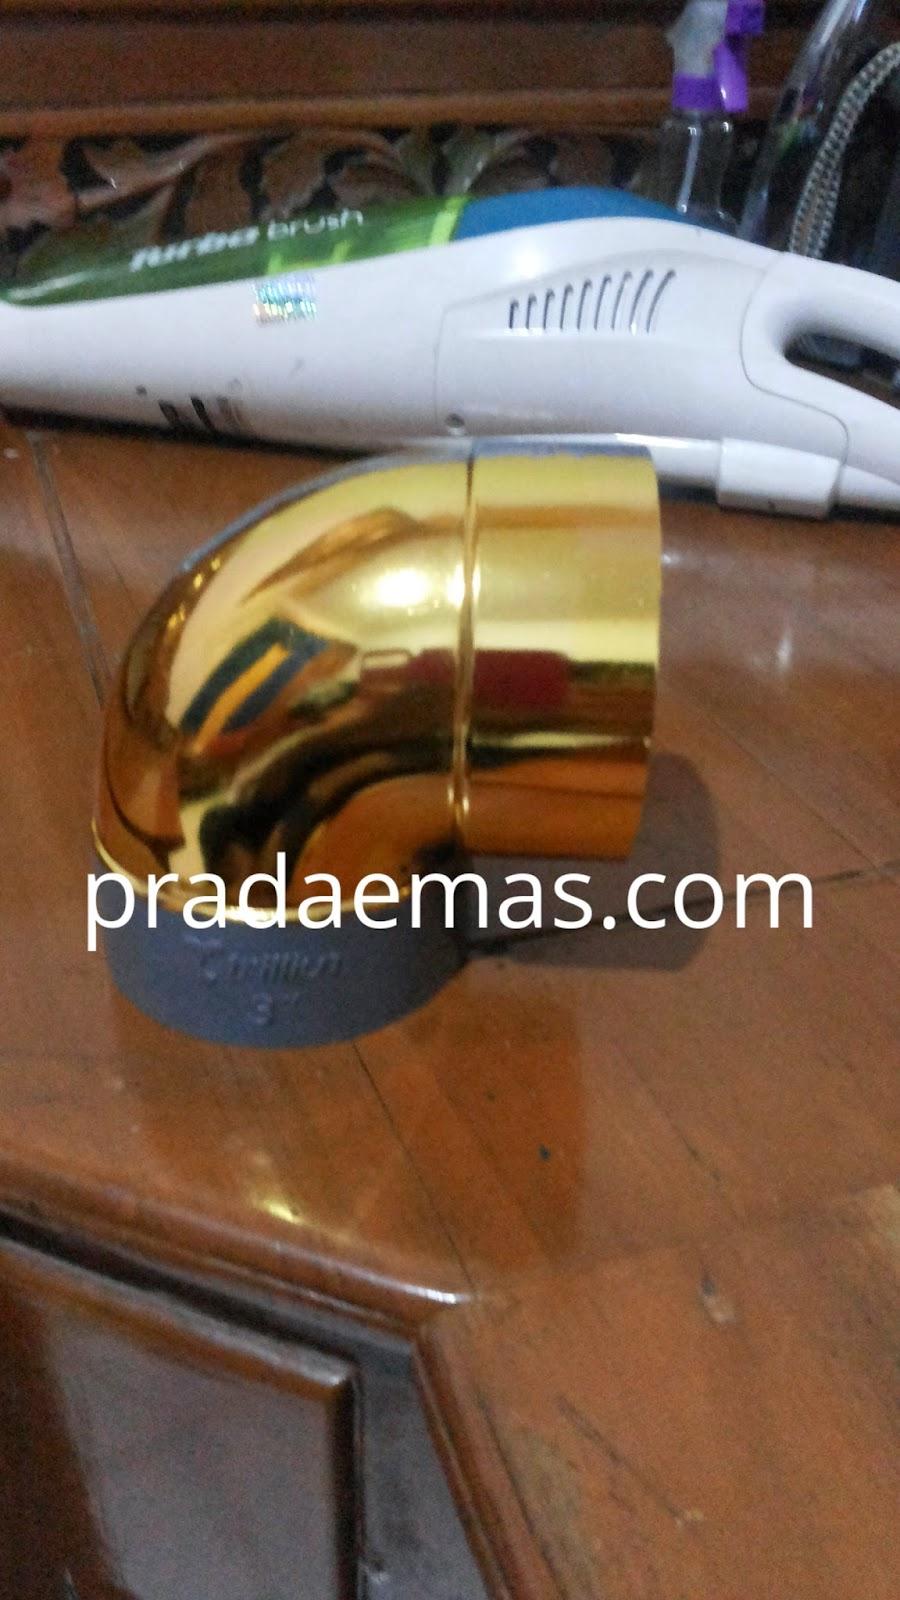 chrome gold chrome sistem tempel dengan prada emas